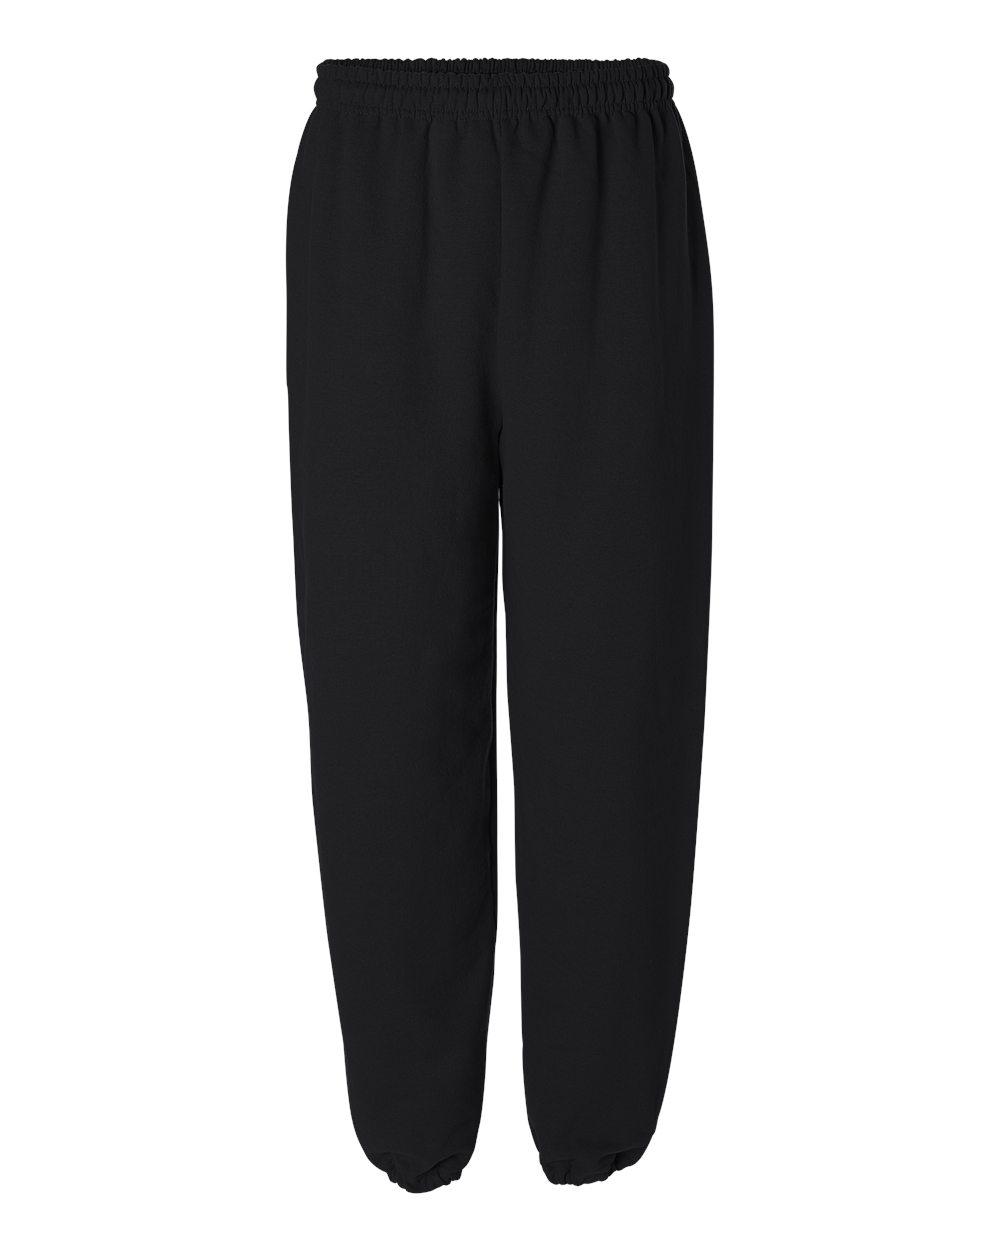 Picture of Gildan Fleece Pants With No Pockets